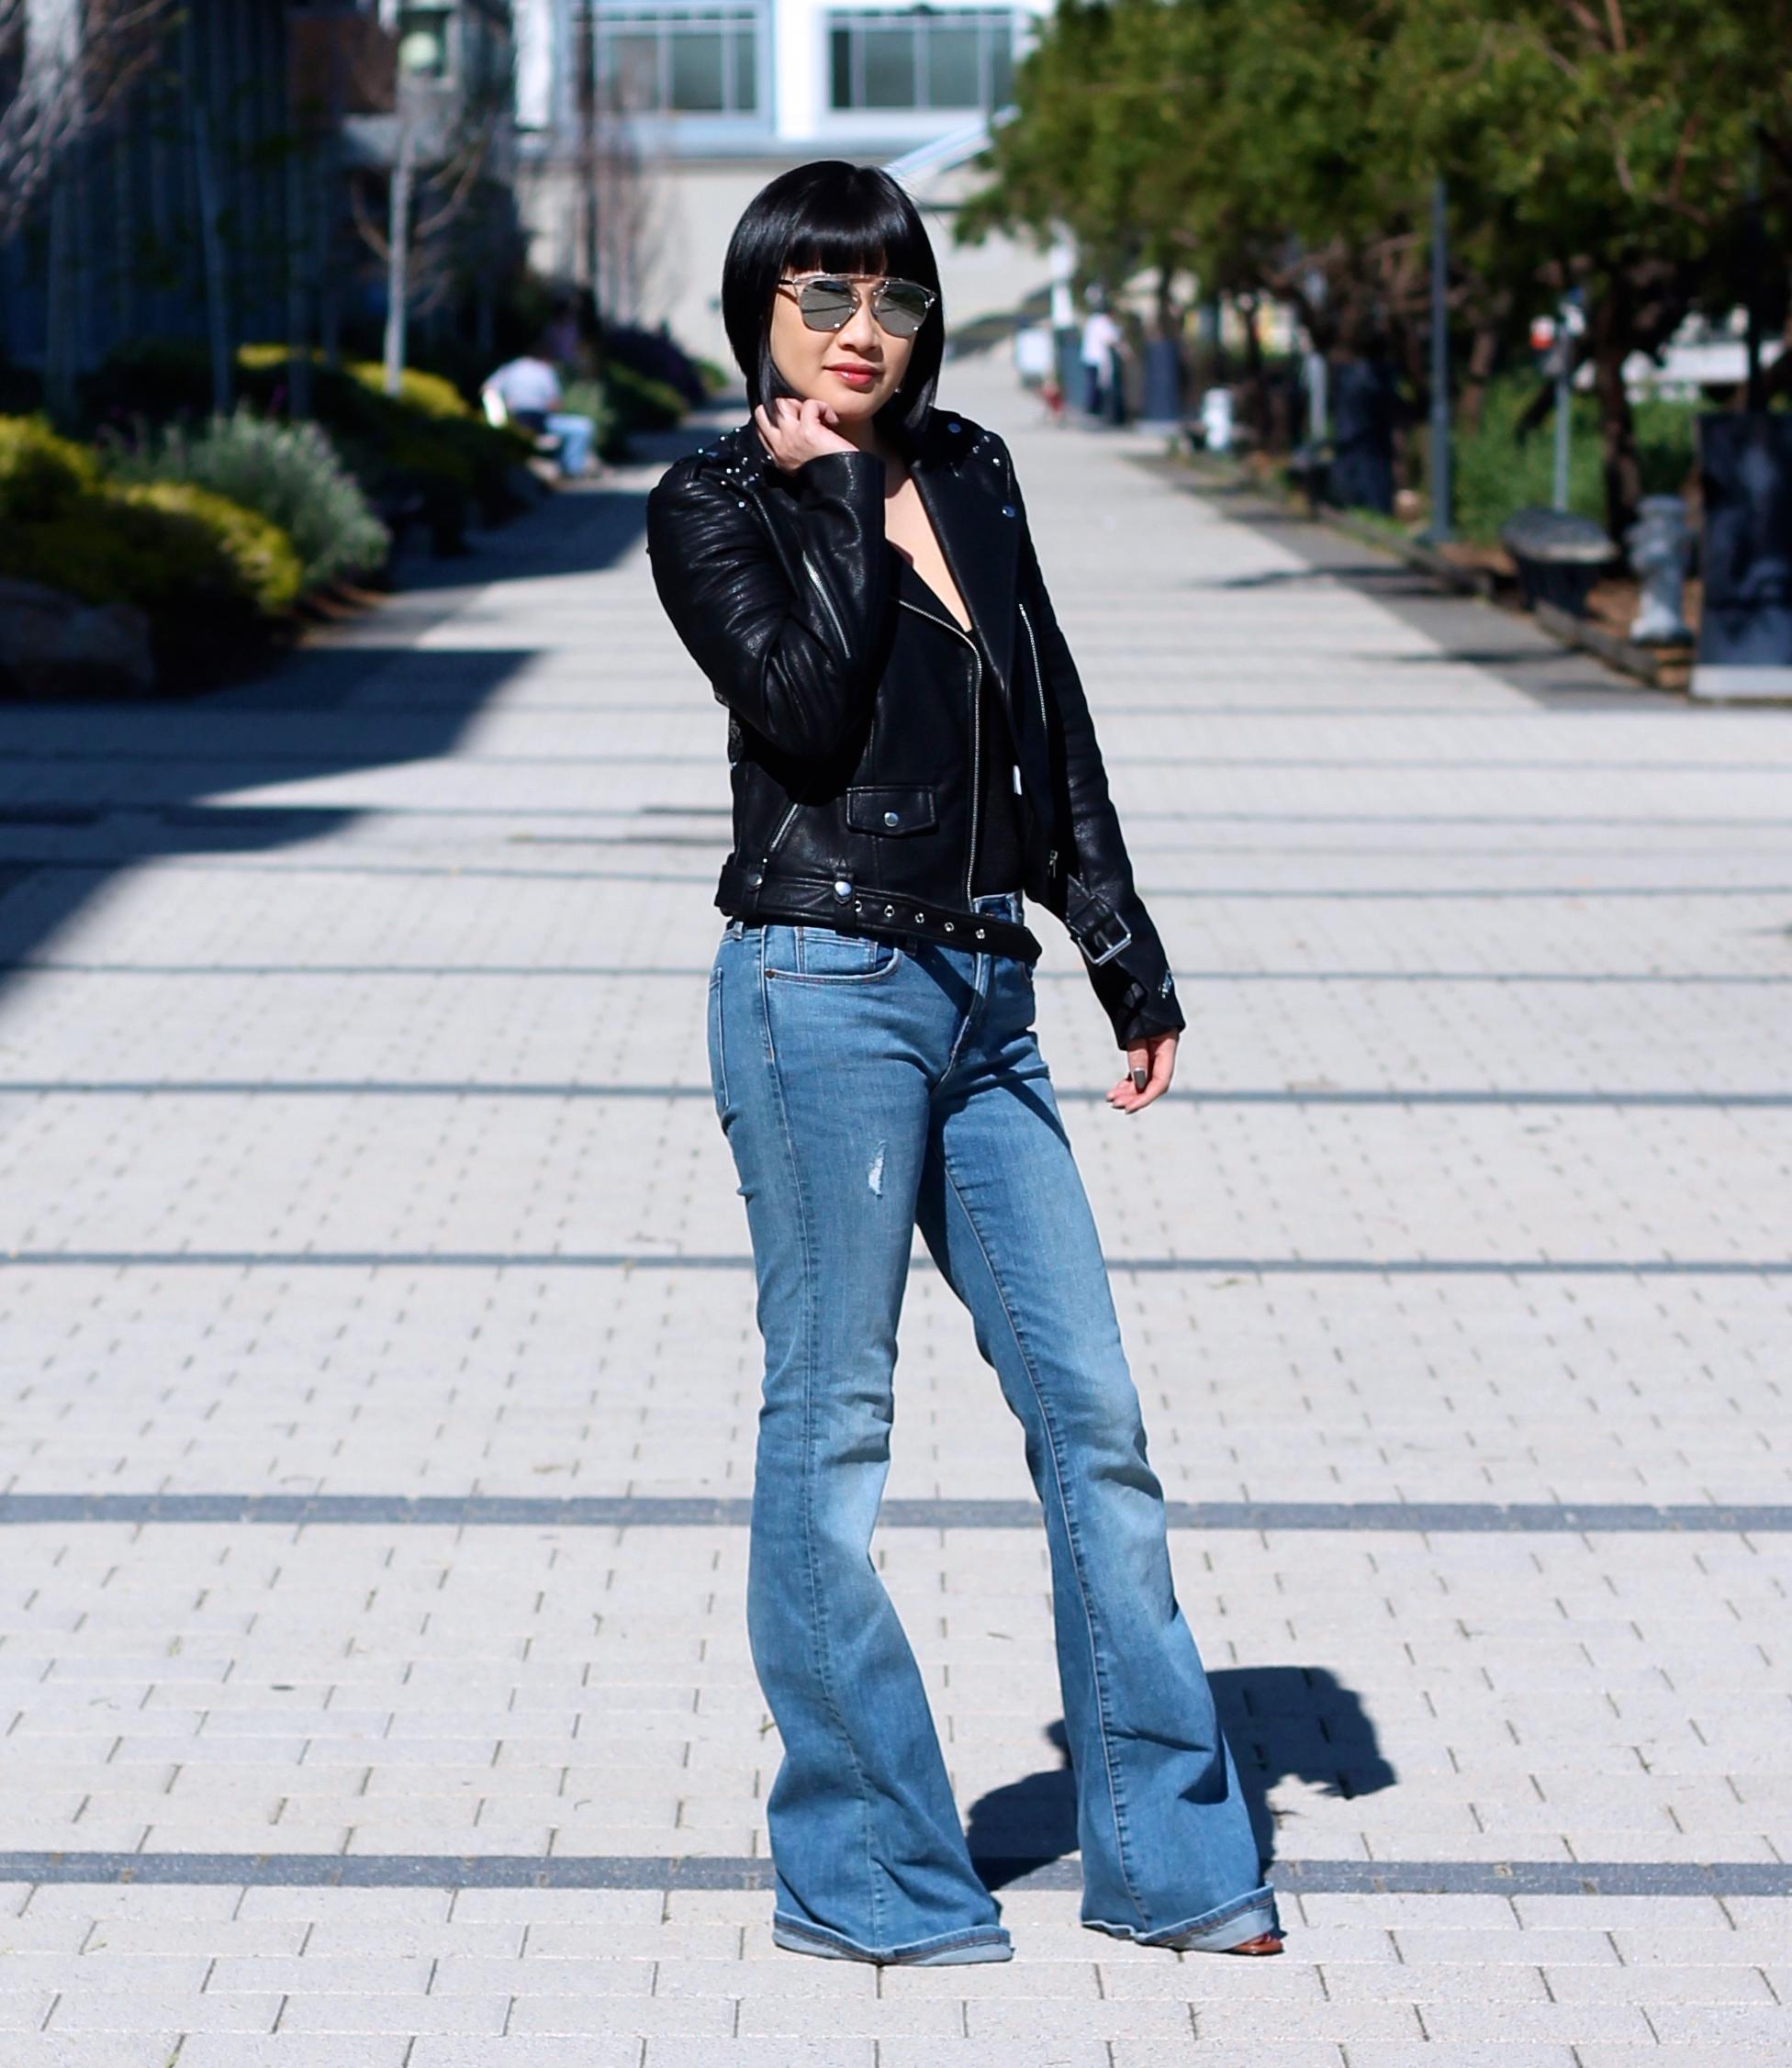 Hair by Sassoon Salon ,  Zara jacket, Banana Republic jeans, Dior sunglasses